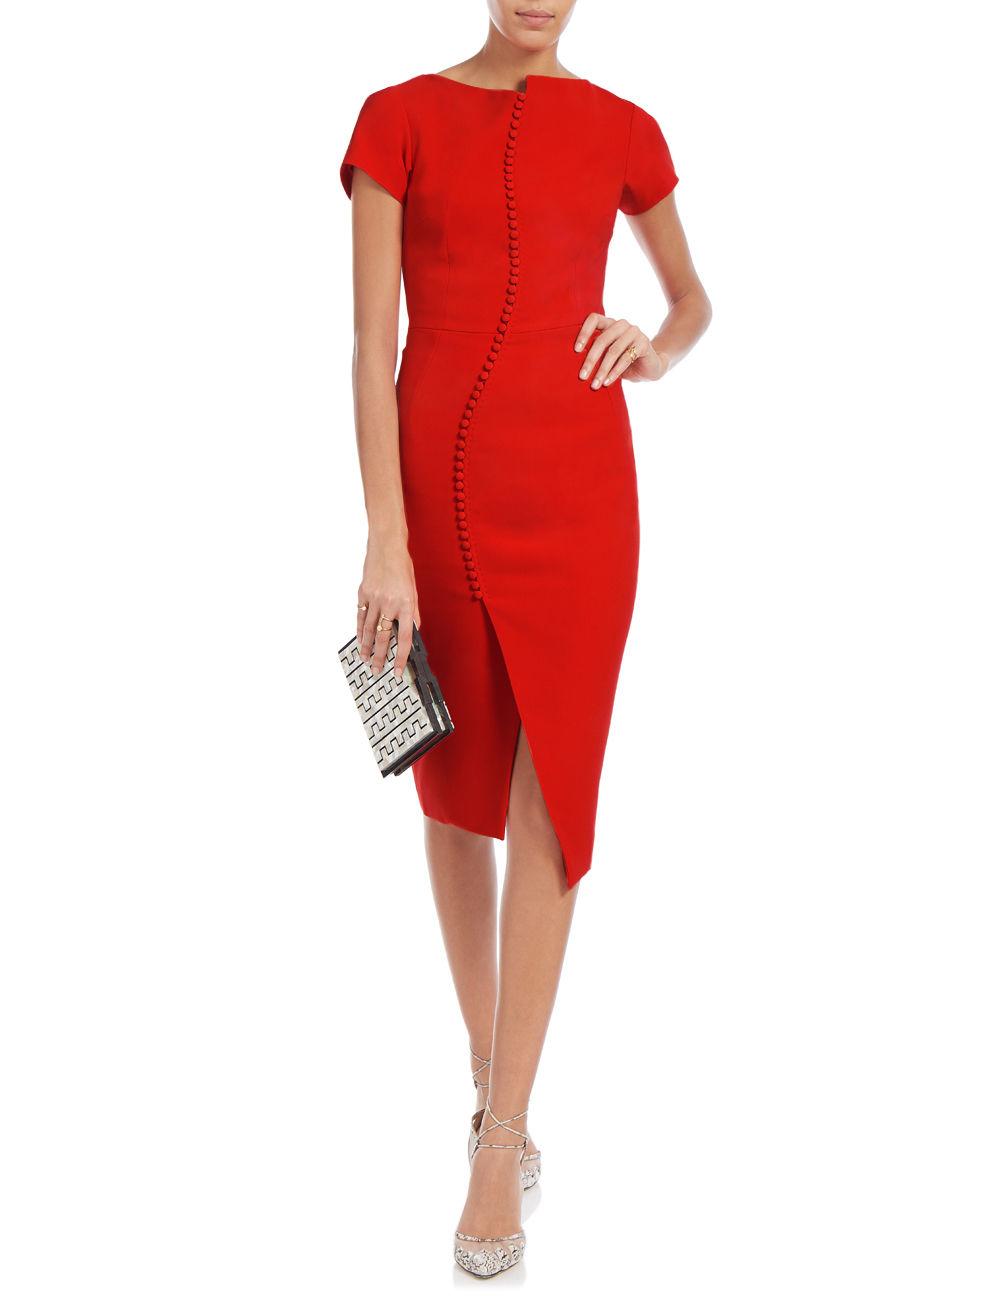 Antonio berardi Red Crepe Button Pencil Dress in Red